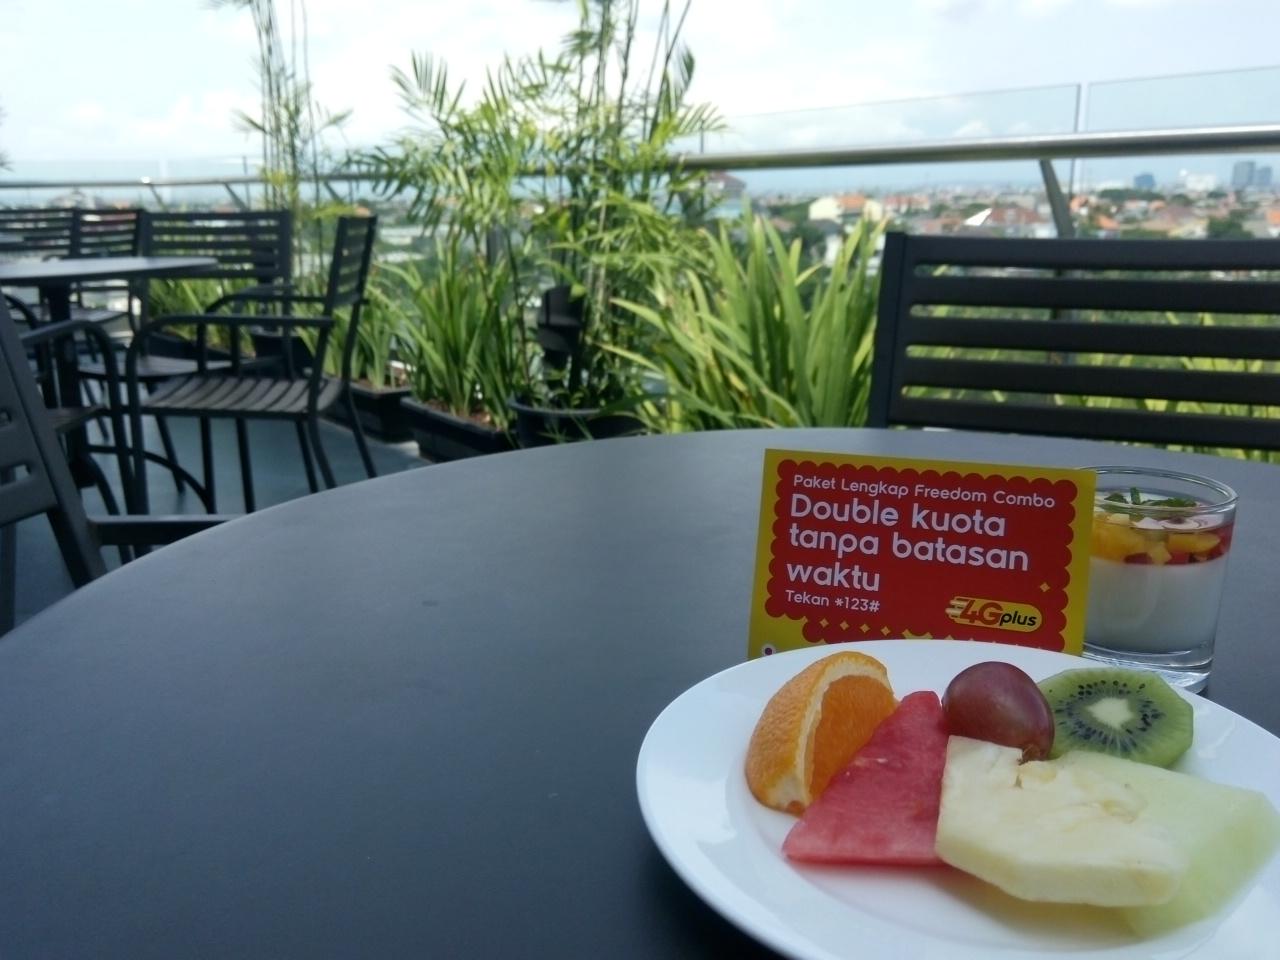 Indosat Ooredoo Freedom Combo Memberikan Kamu Kebebasan Dunia Kuota L Sebelum Masuk Ke Xxi Garden Cafe Untuk Makan Siang Bersama Undangan Yang Lainnya Seperti Biasa Semua Diminta Registrasi Terlebih Dahulu